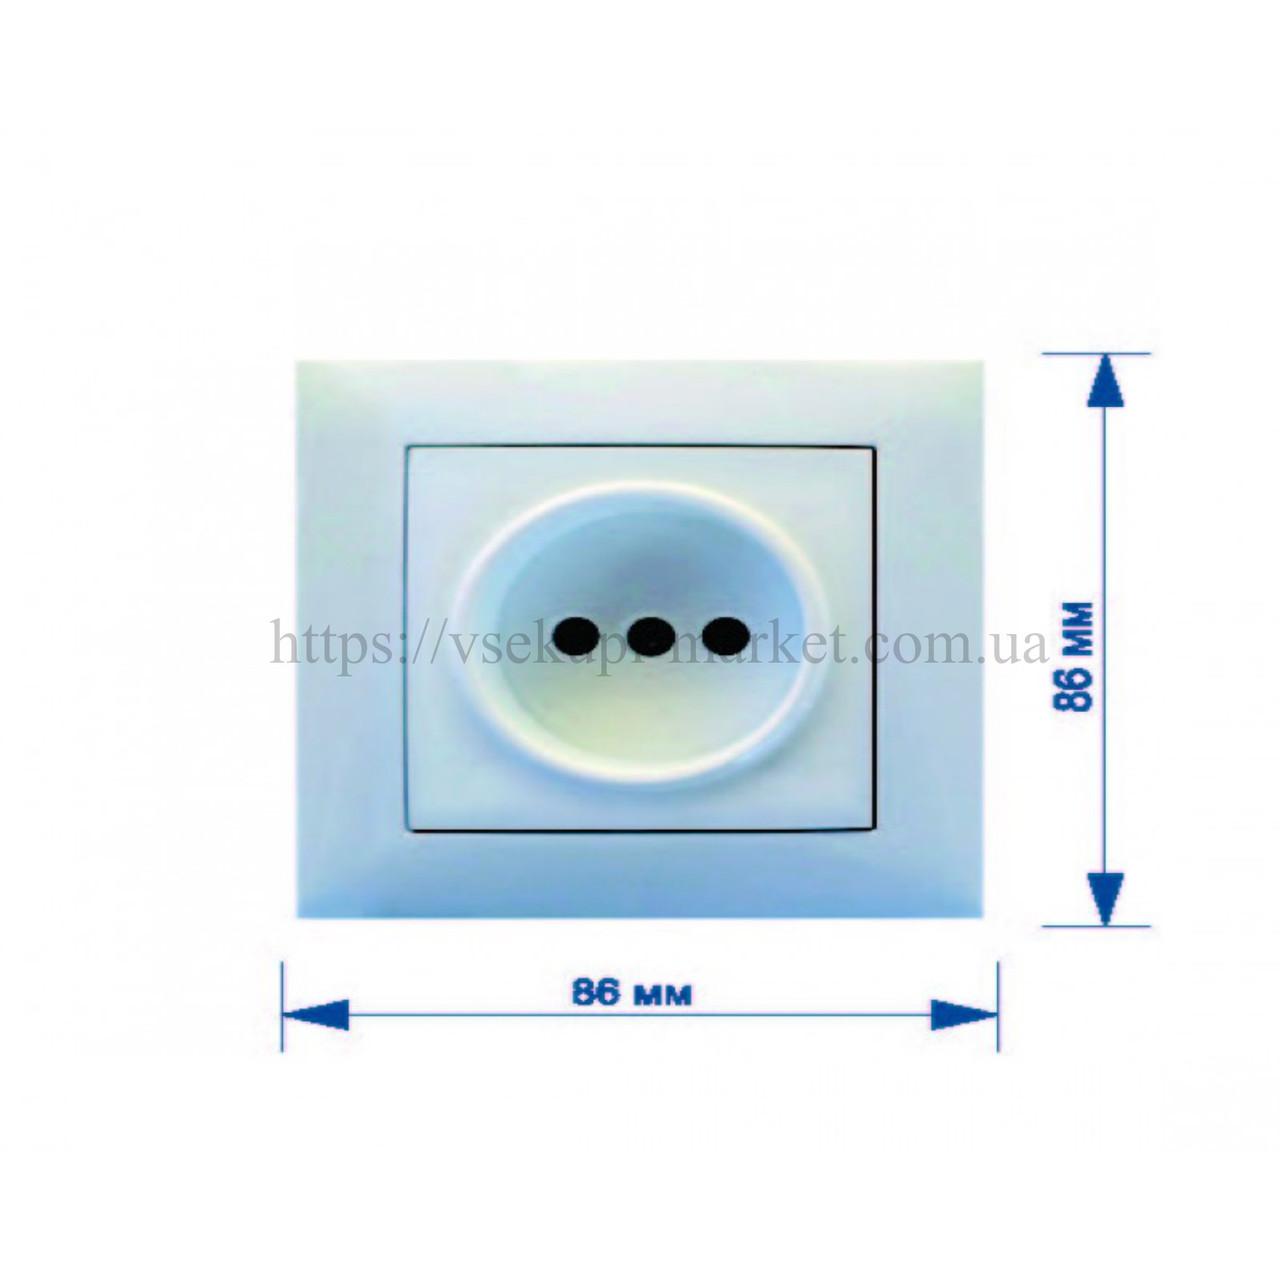 Розетка RIGHT HAUSEN VELENA одинарная внутренняя керамика HN-016071 (бежевая, белая)